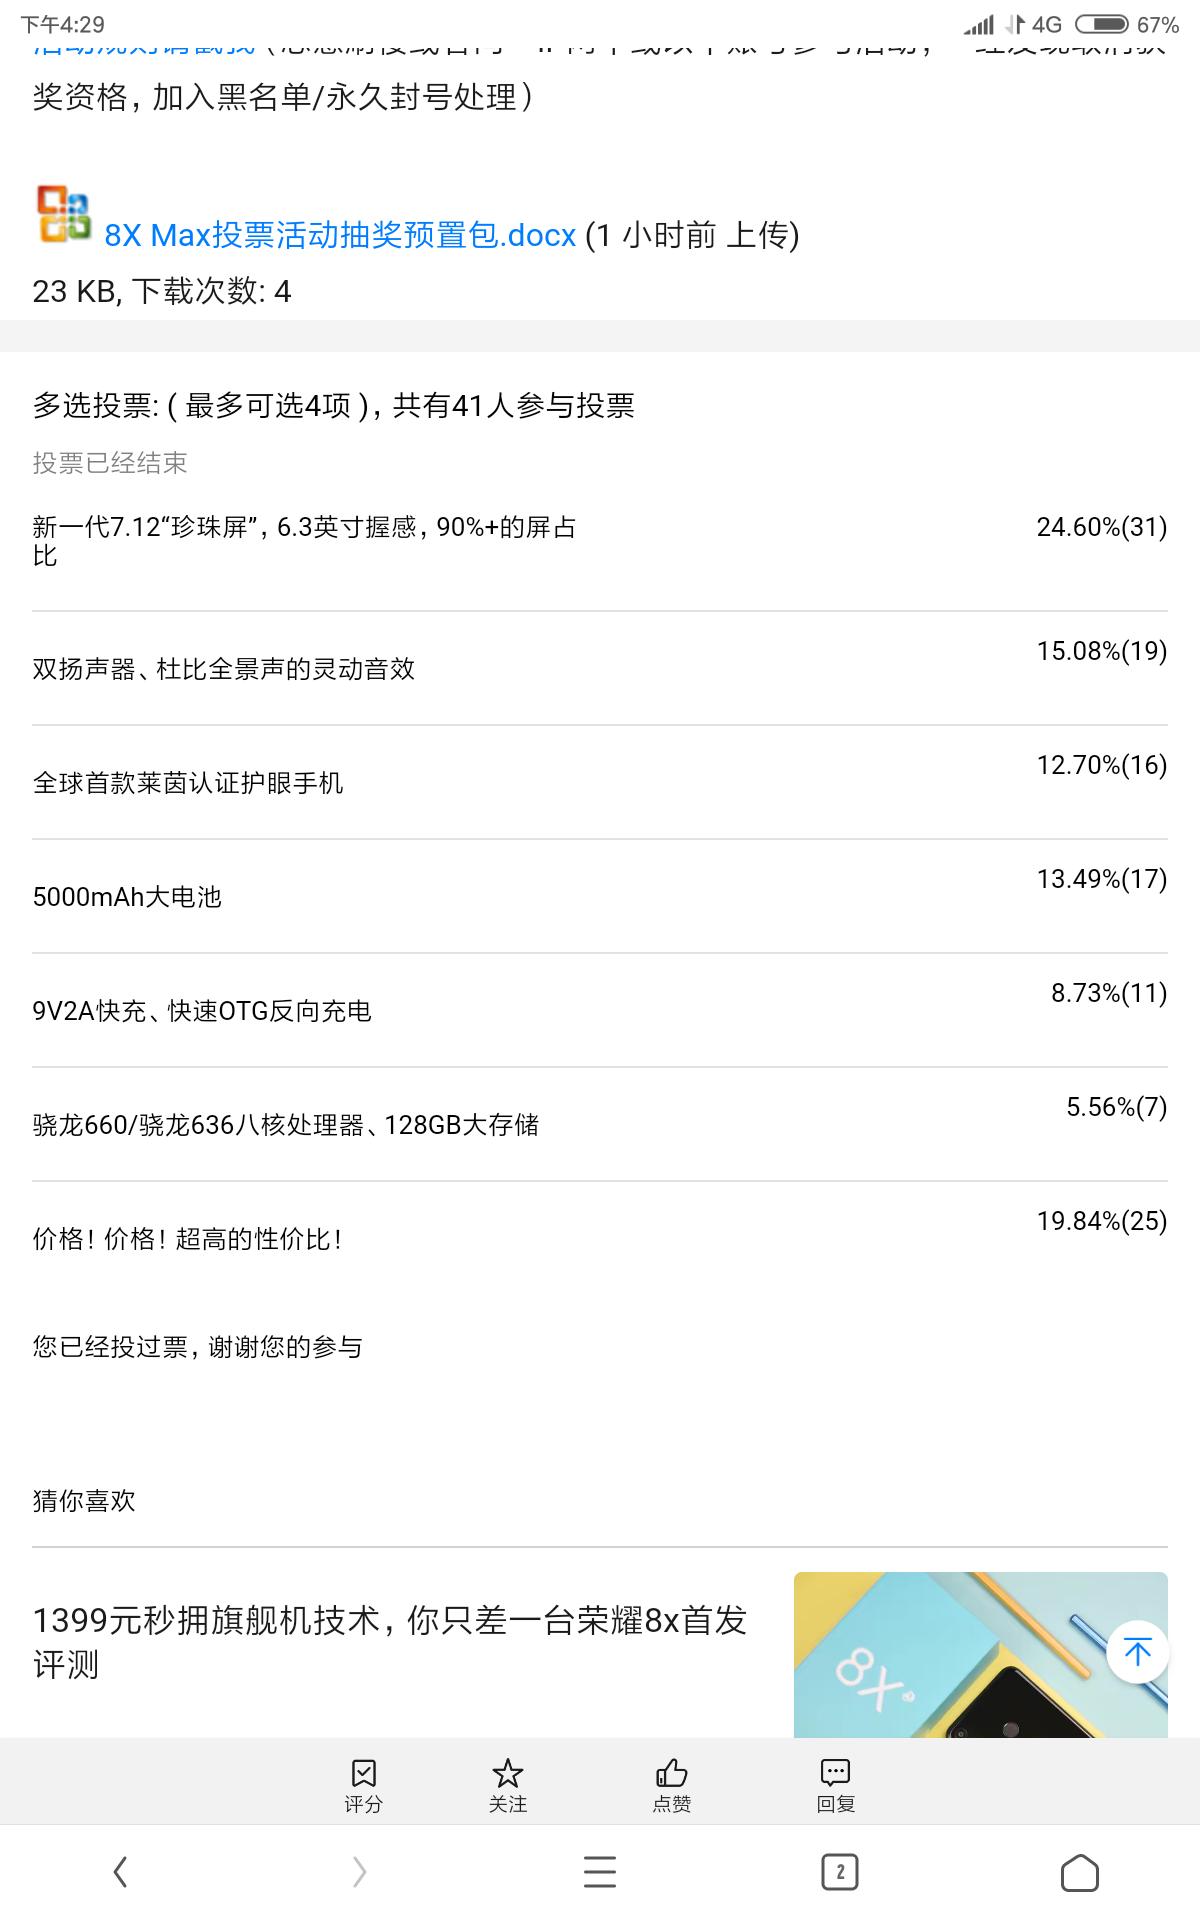 Screenshot_2018-09-06-16-29-26-667_com.UCMobile.png